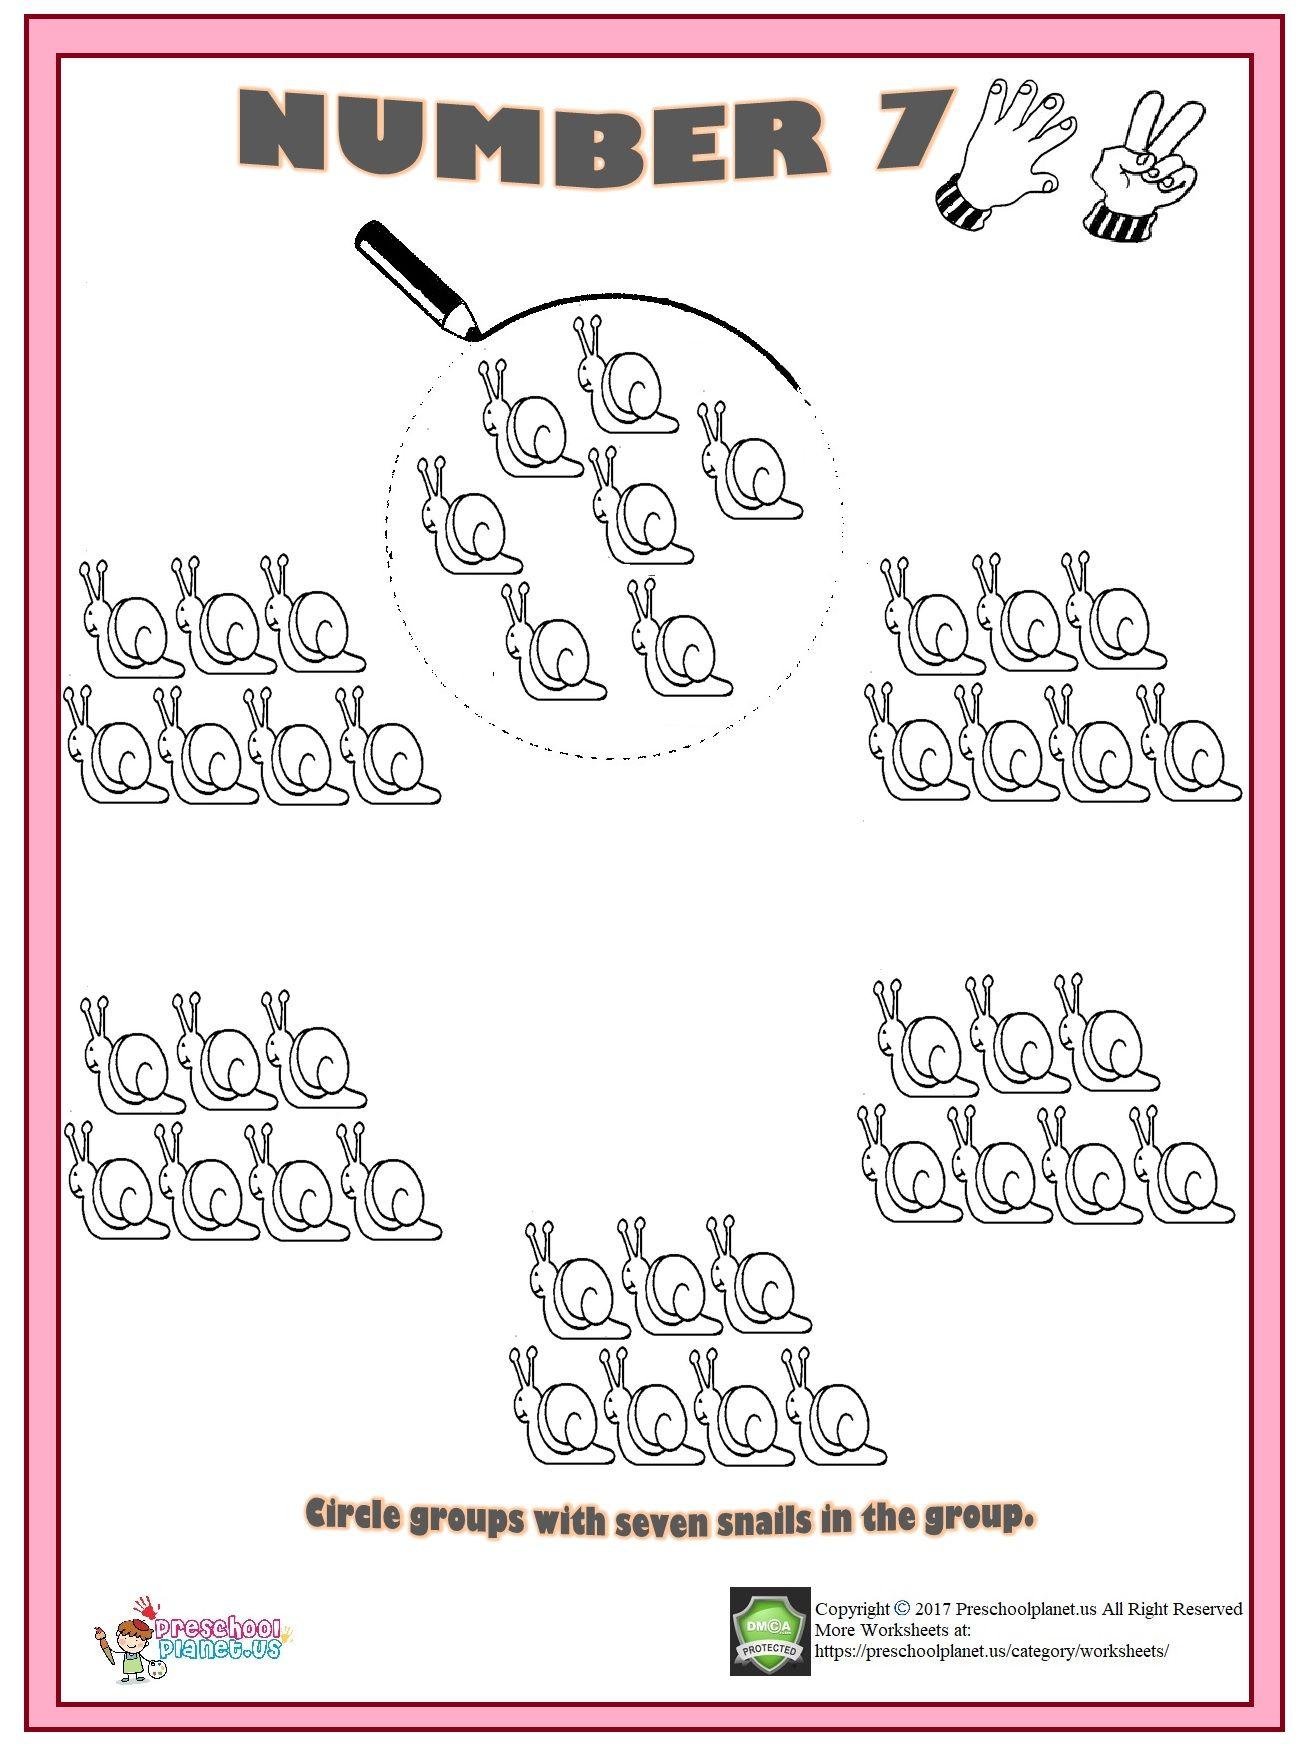 Number 7 Worksheet Preschool Worksheets Numbers Preschool Kindergarten Phonics Worksheets [ 1753 x 1301 Pixel ]